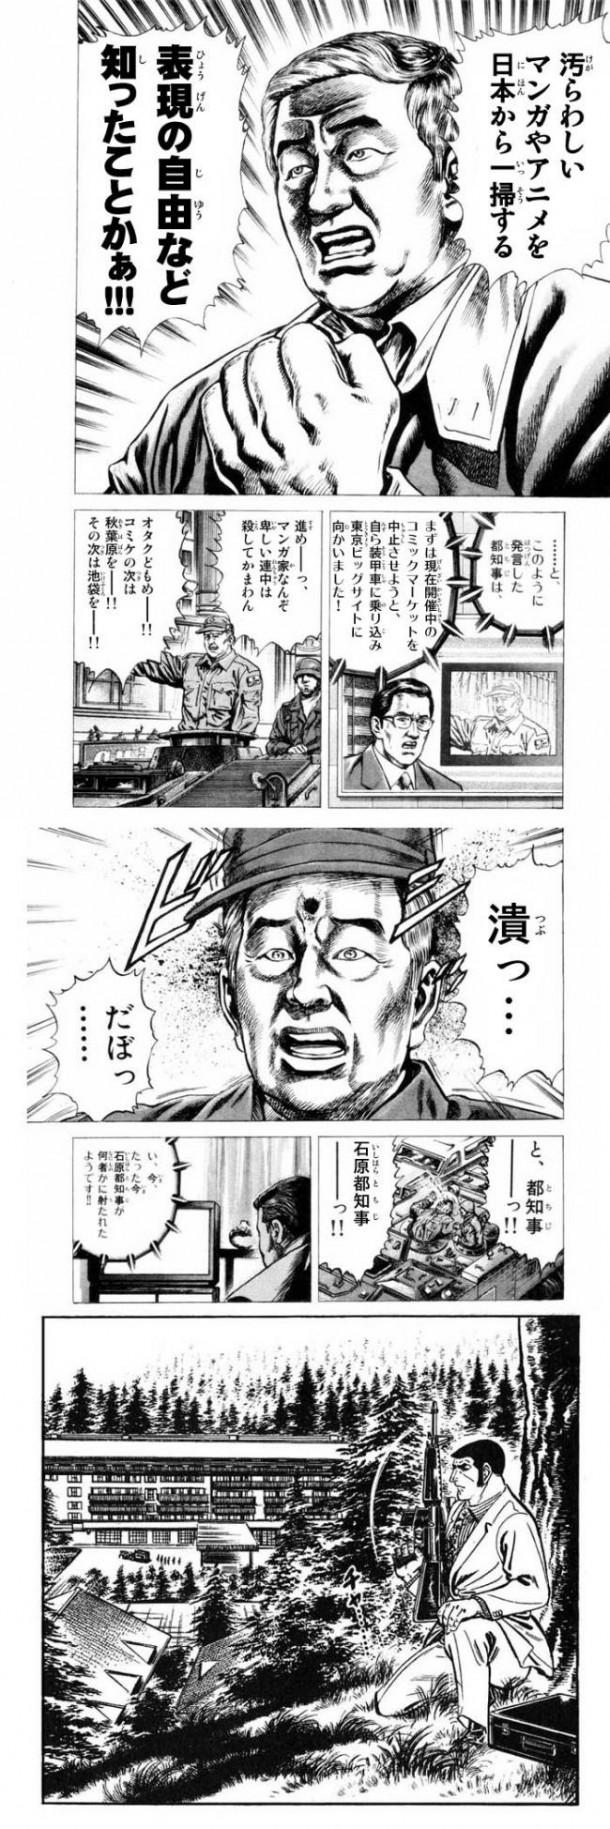 ishihara-gorugo1-610x1829.jpg